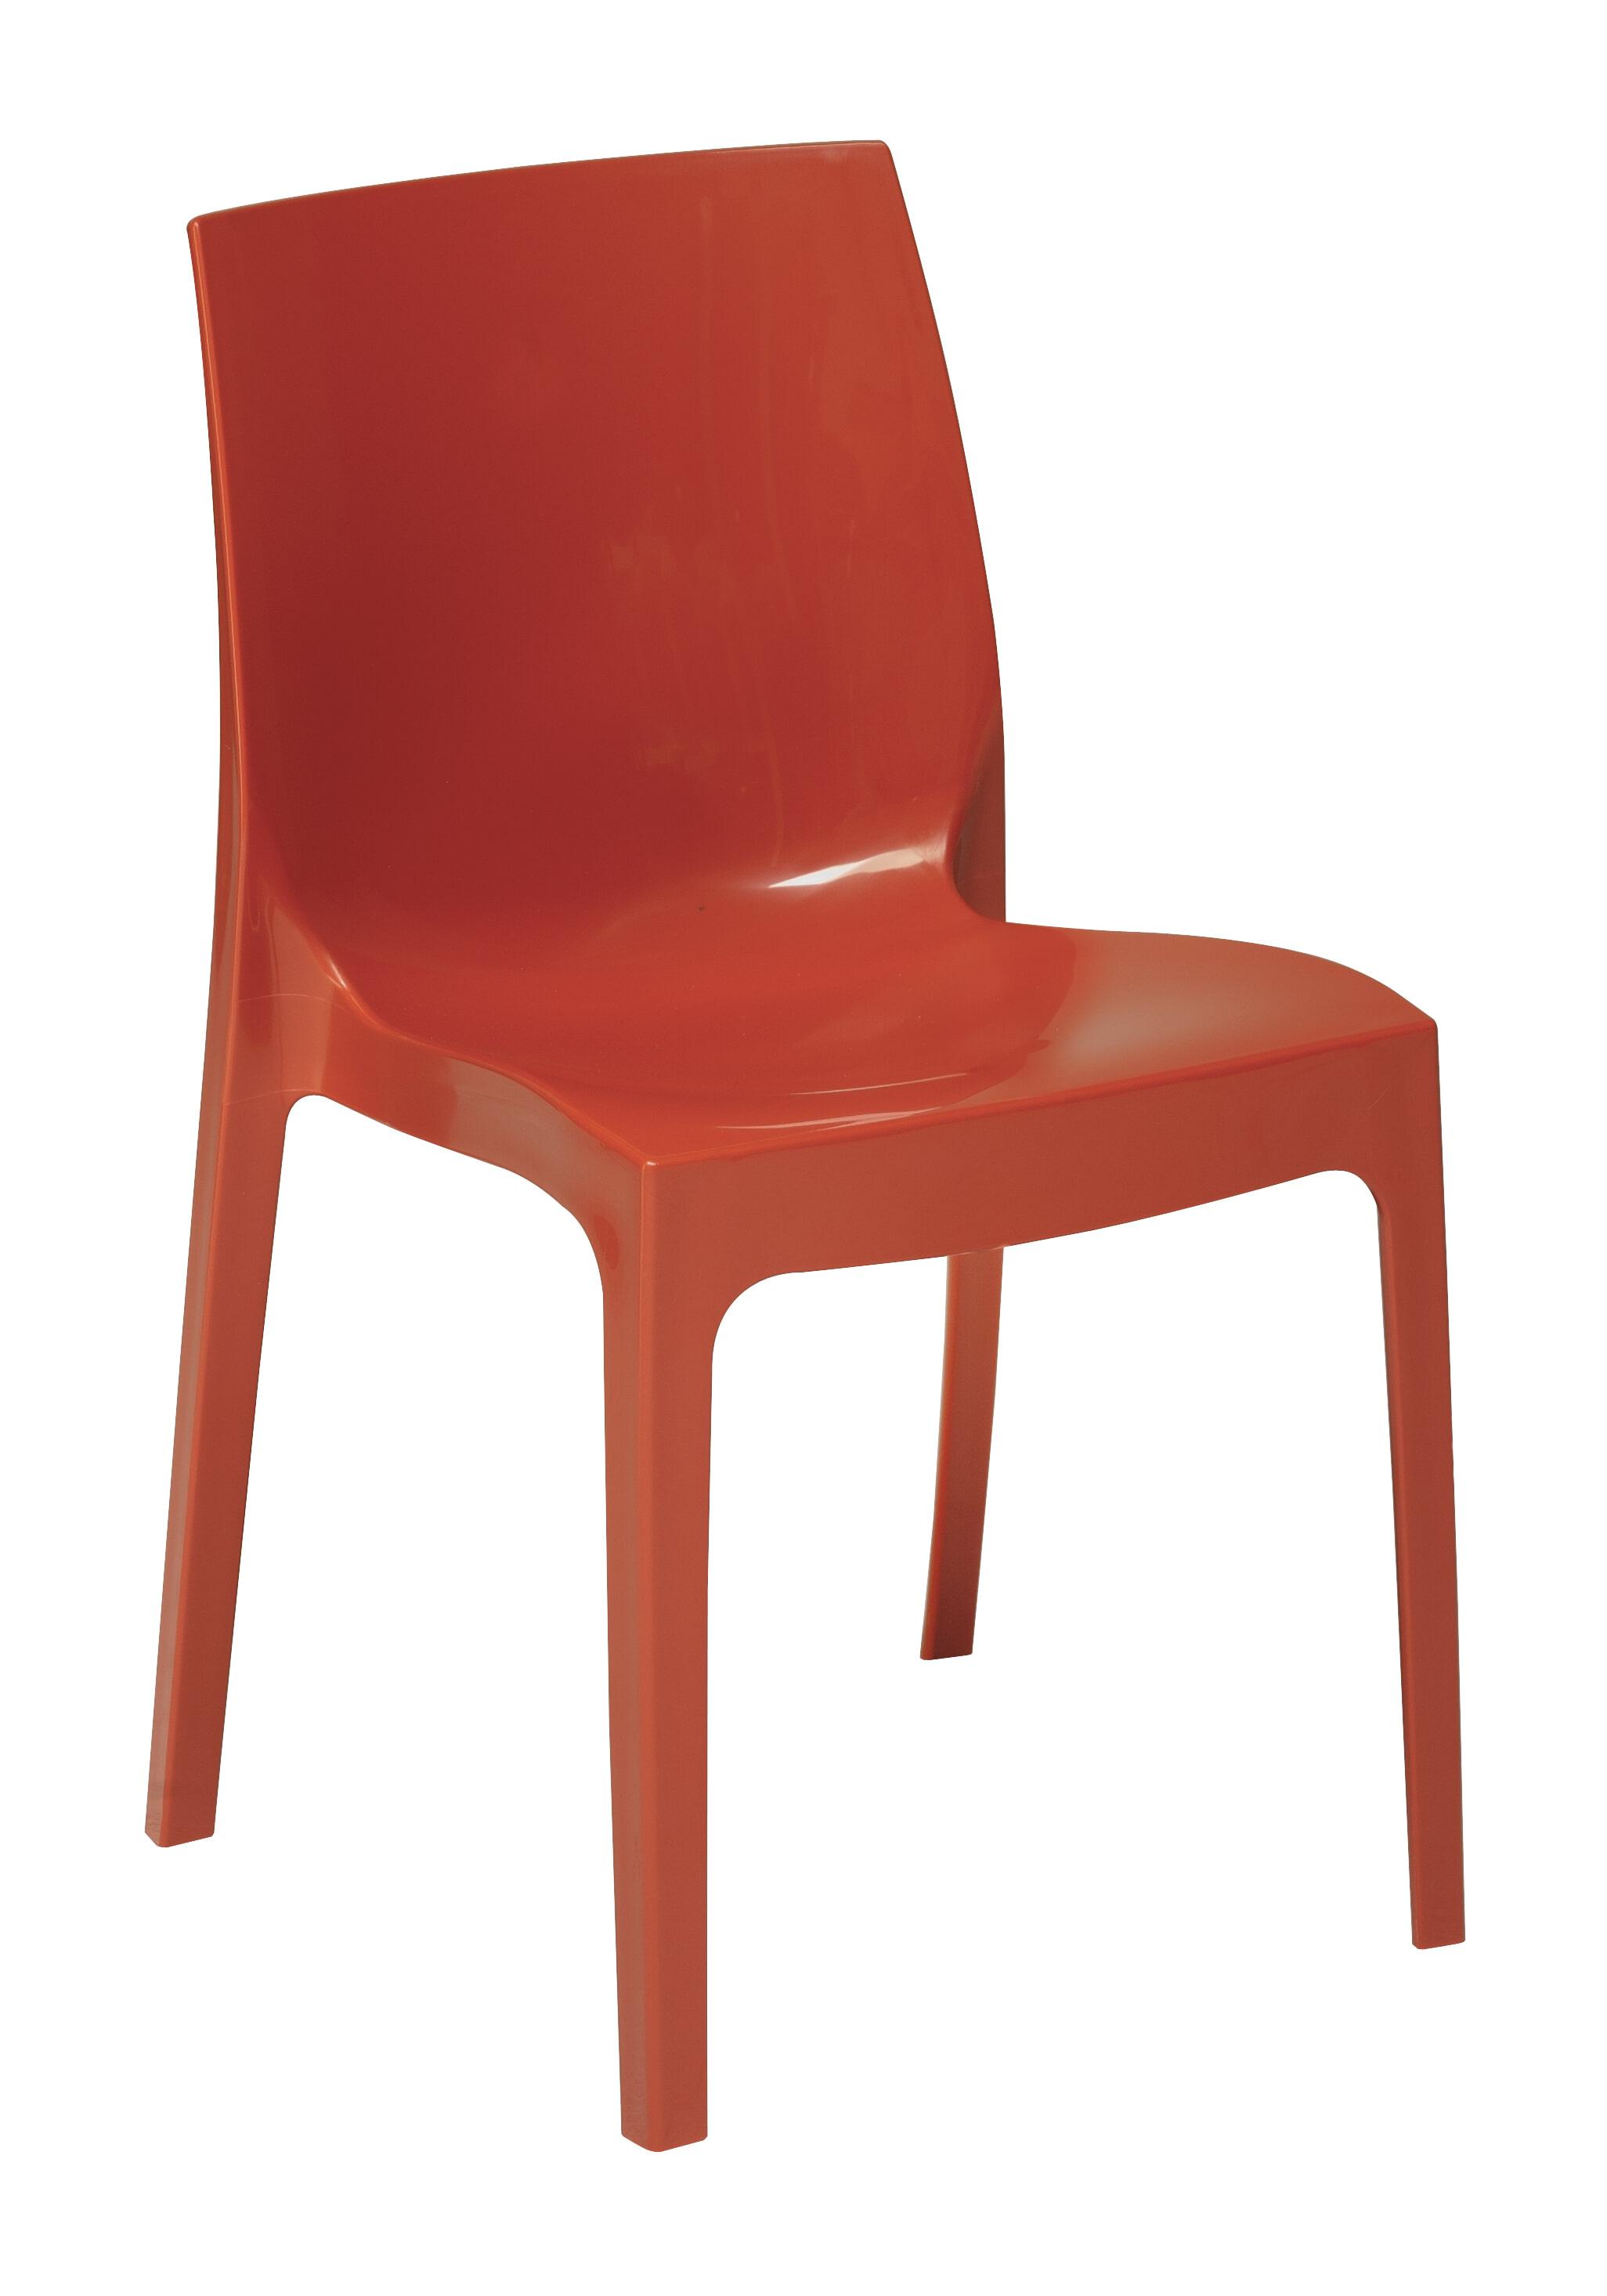 Artistiq Eetkamerstoel 'Tammie' kleur Rood